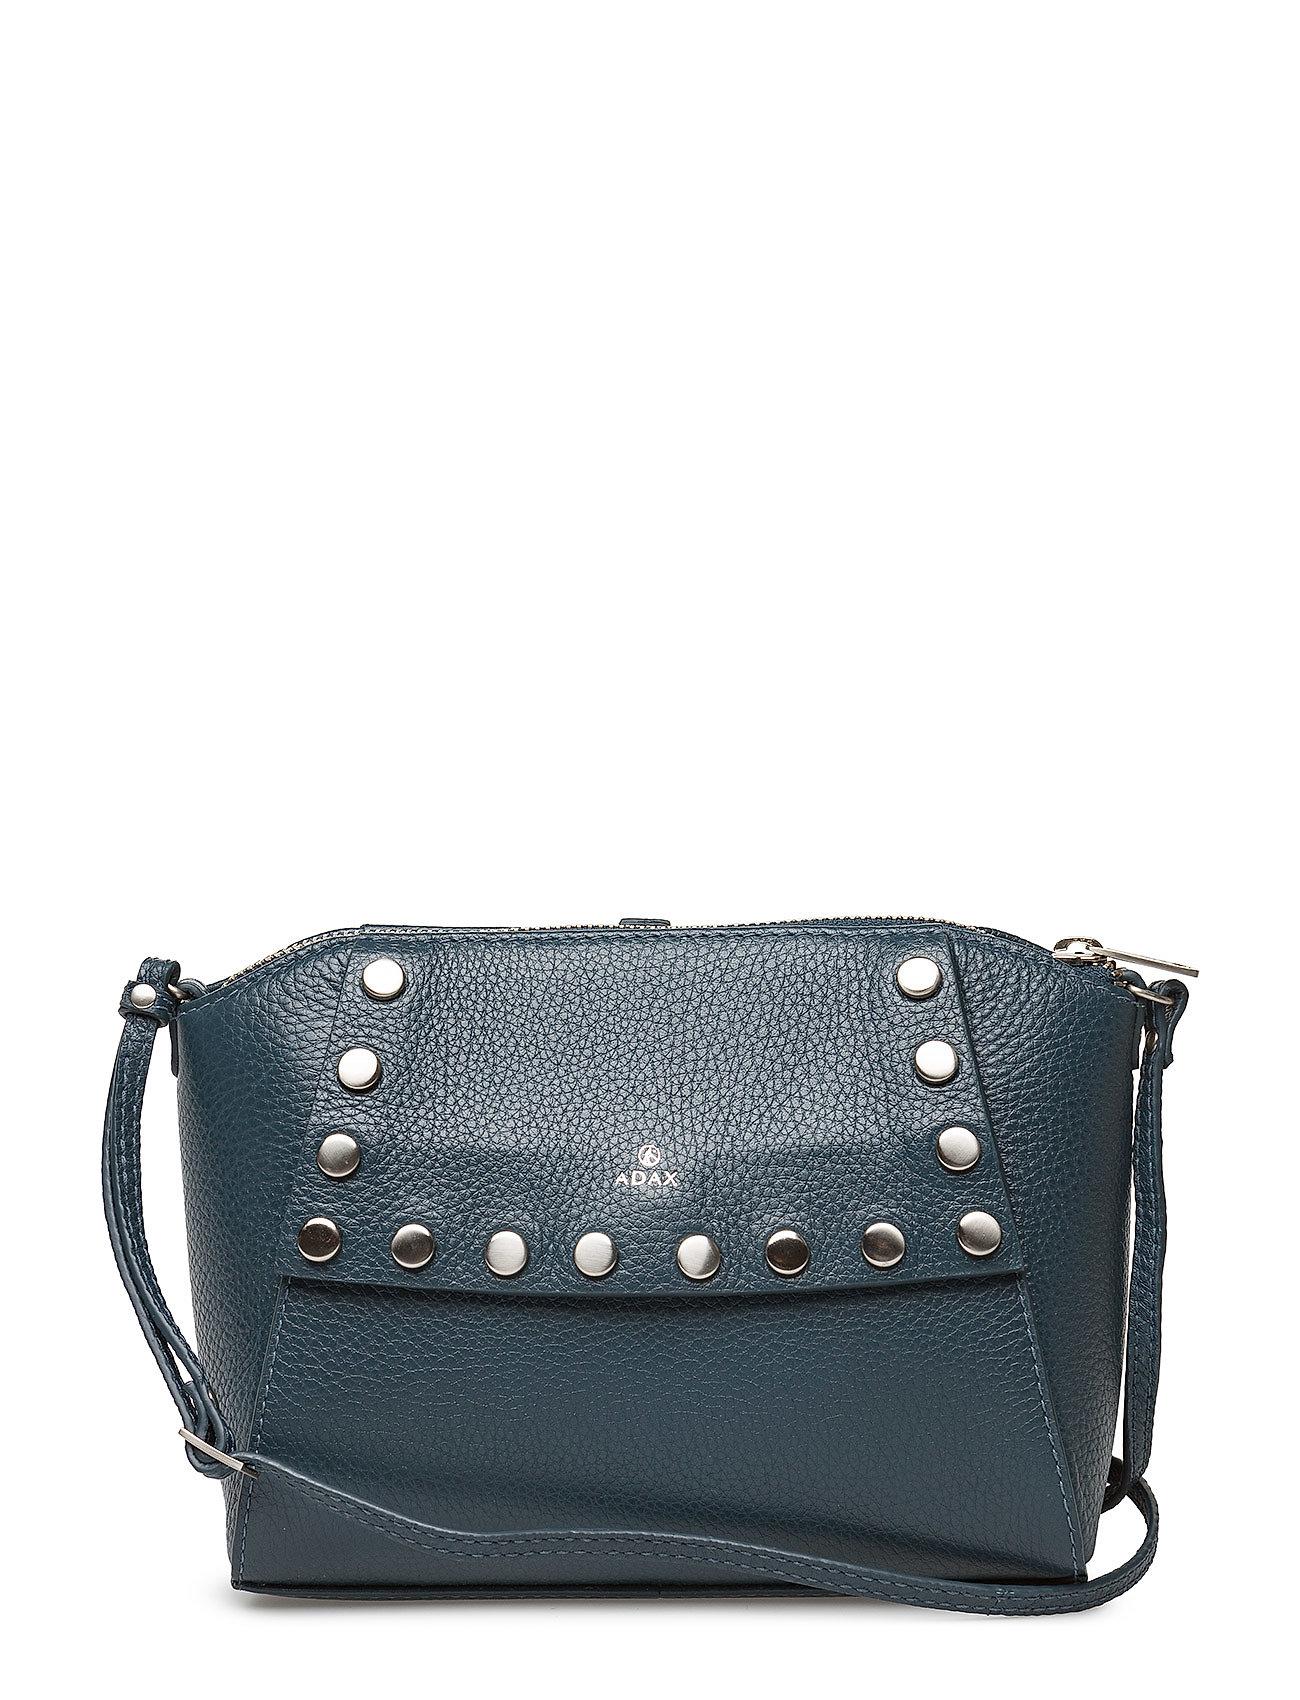 Niccone Evening Bag Milena - Adax